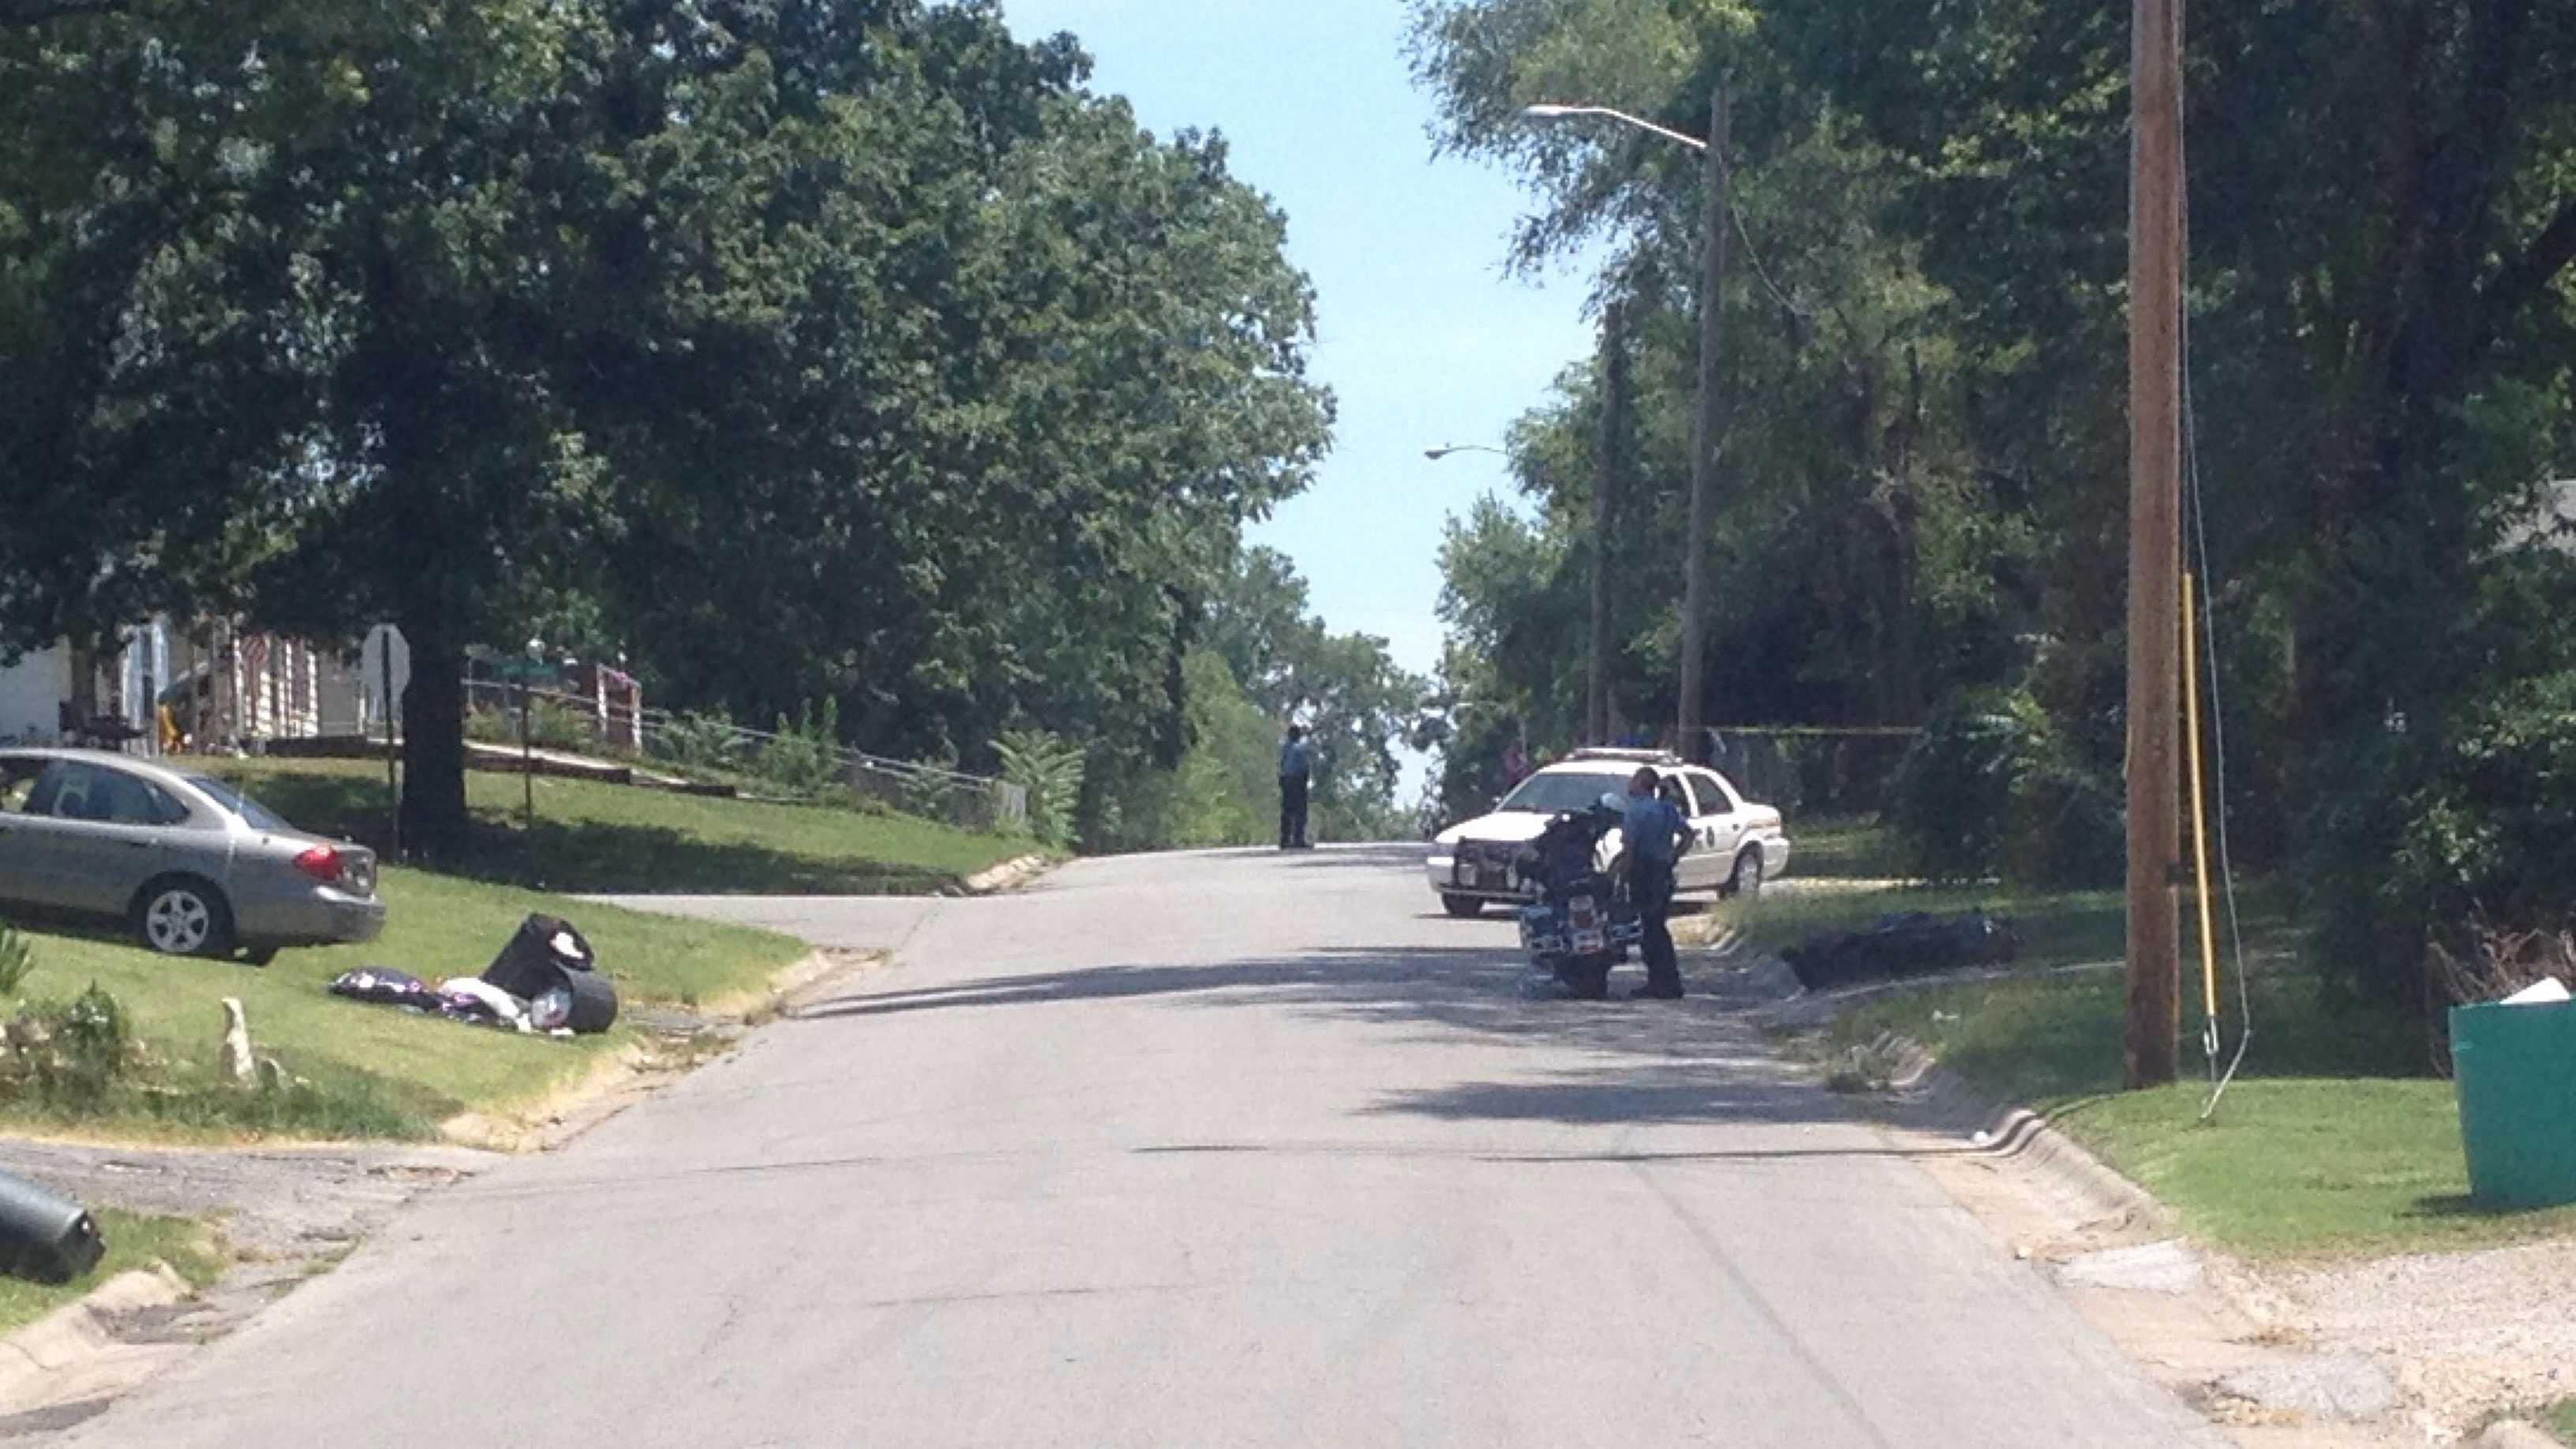 KCK standoff, 49th, Oak Grove Road